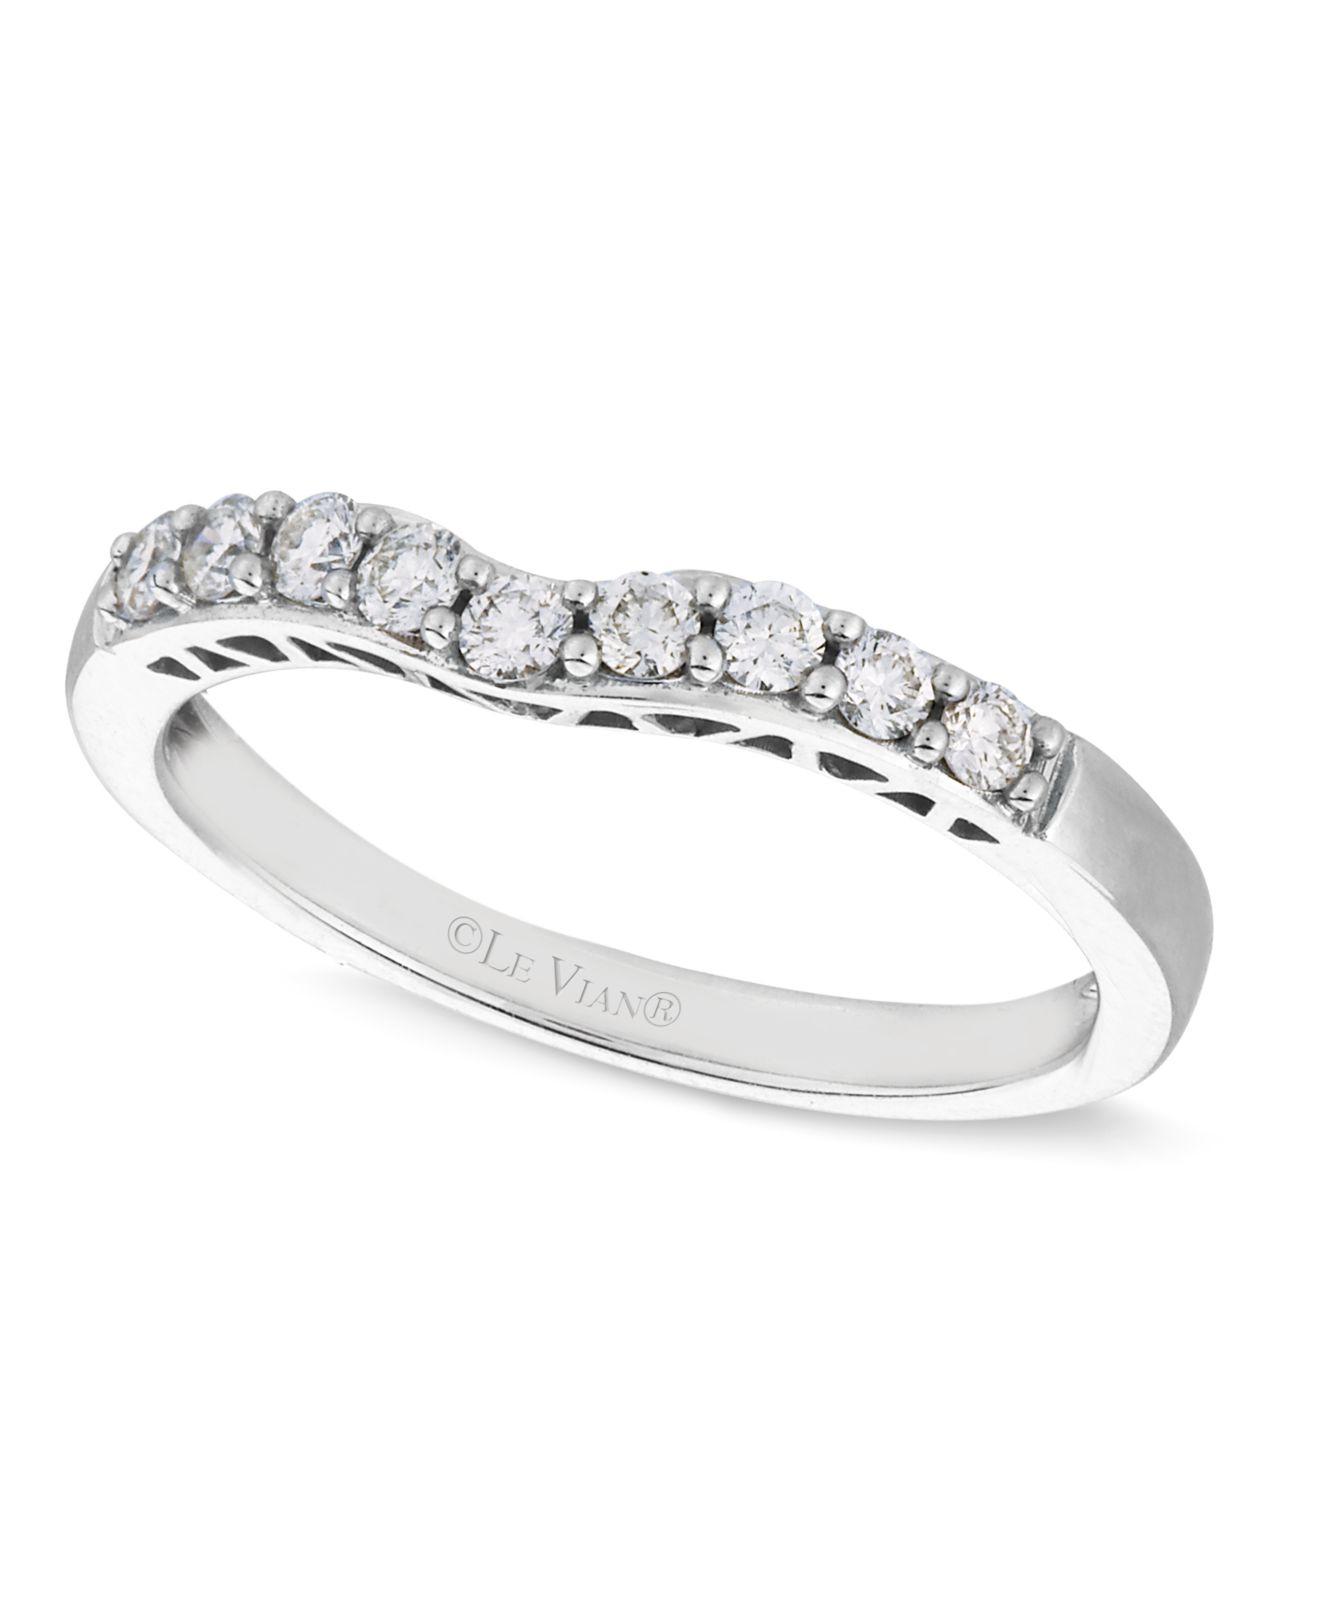 le vian diamond 14k white gold wedding band 14 ct tw 1 le vian wedding bands Le Vian Women s Diamond Diamond Wedding Band